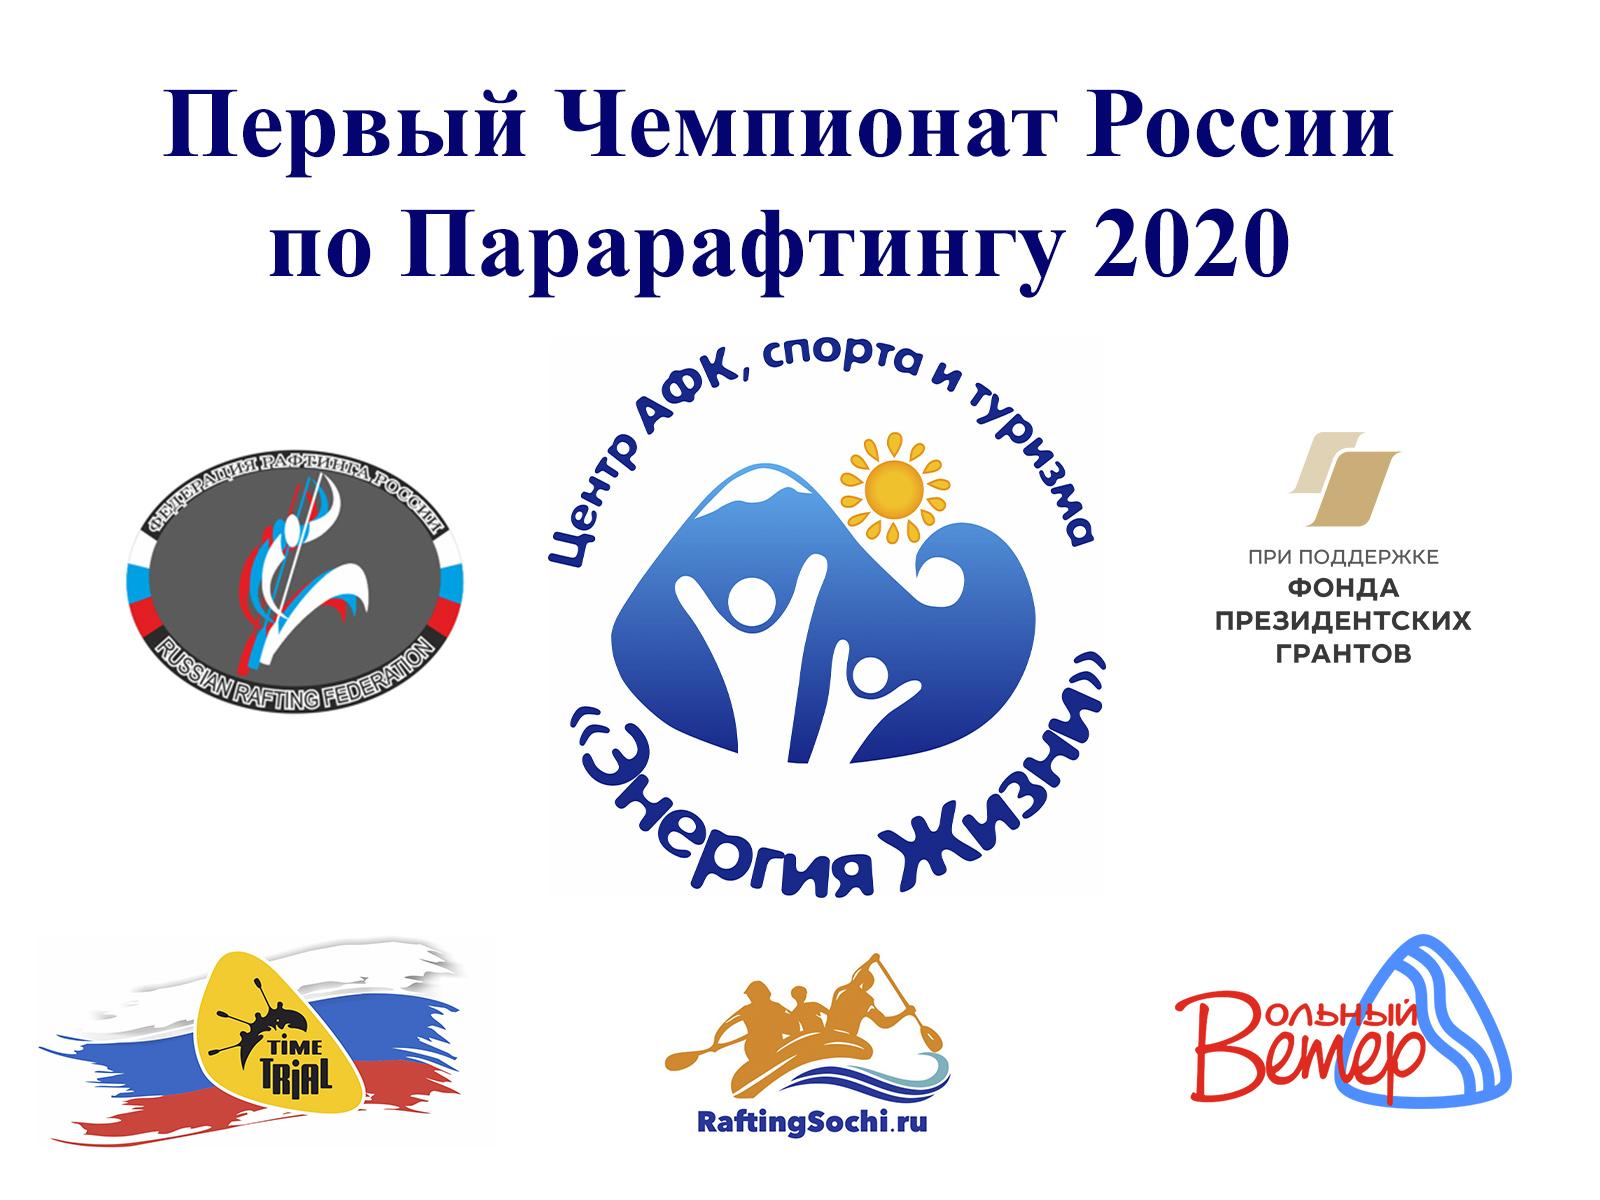 Парарафтинг, Чемпионат России